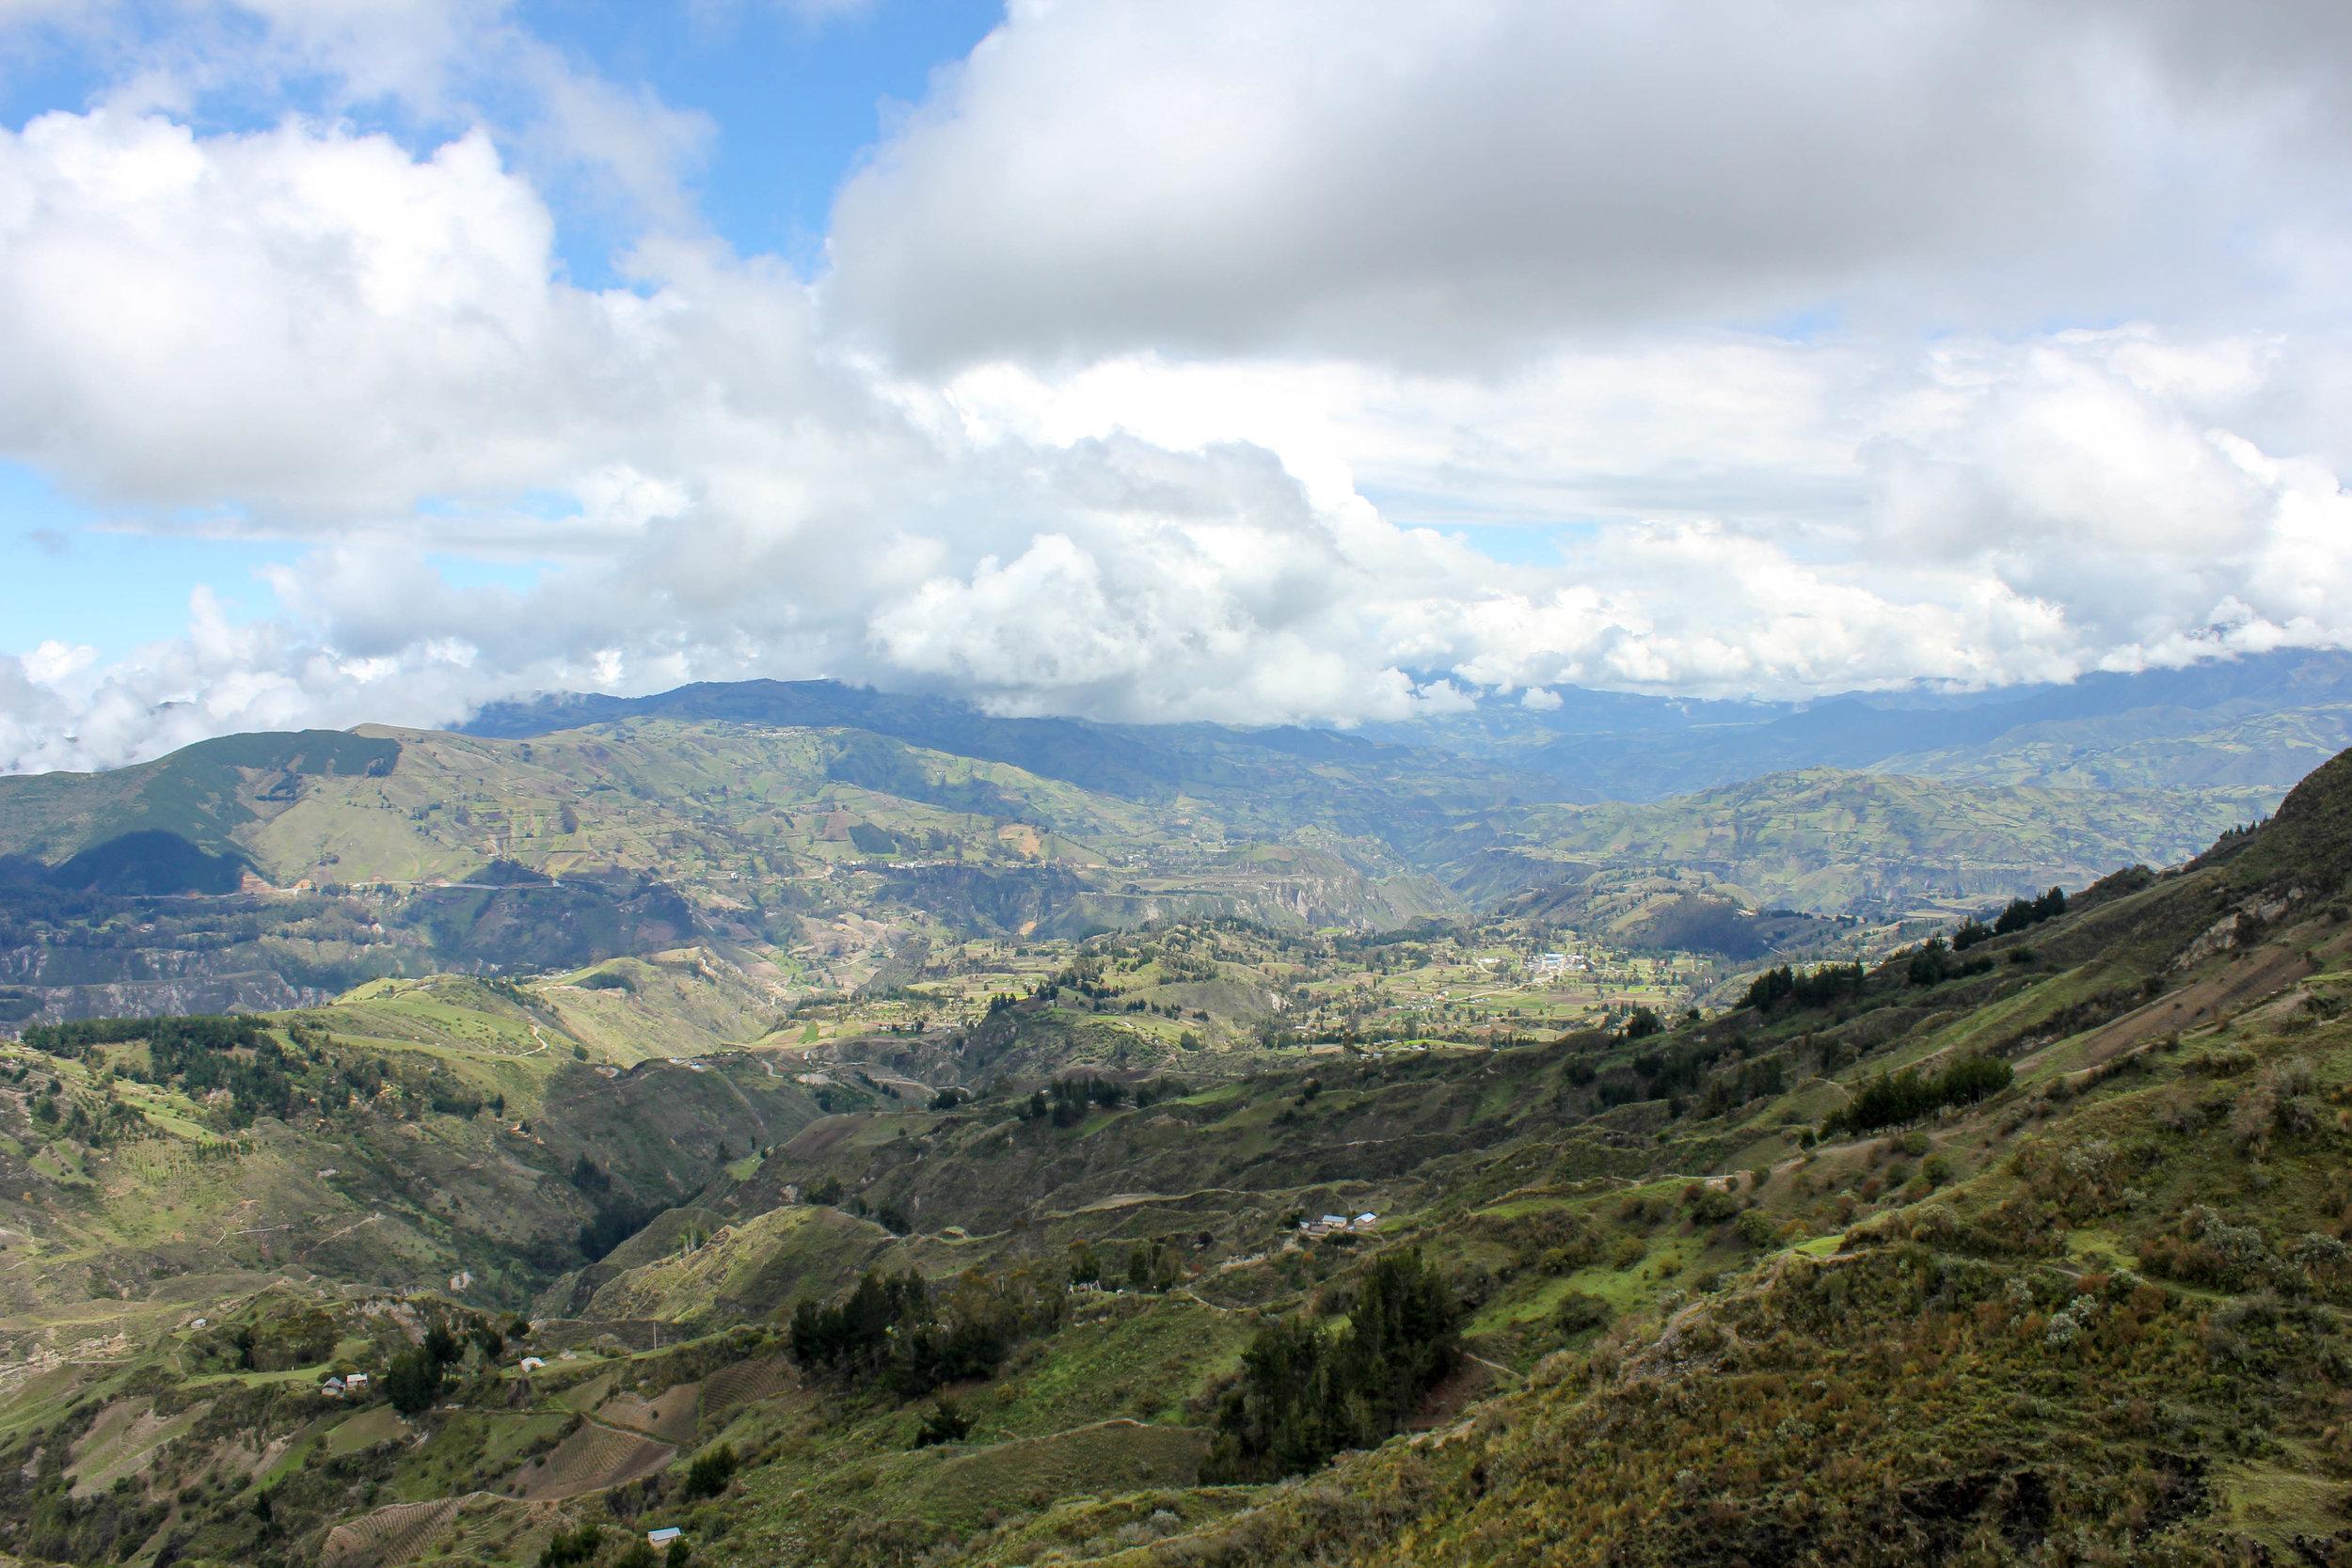 Verdant Landscape of the Ecuadorian Andes